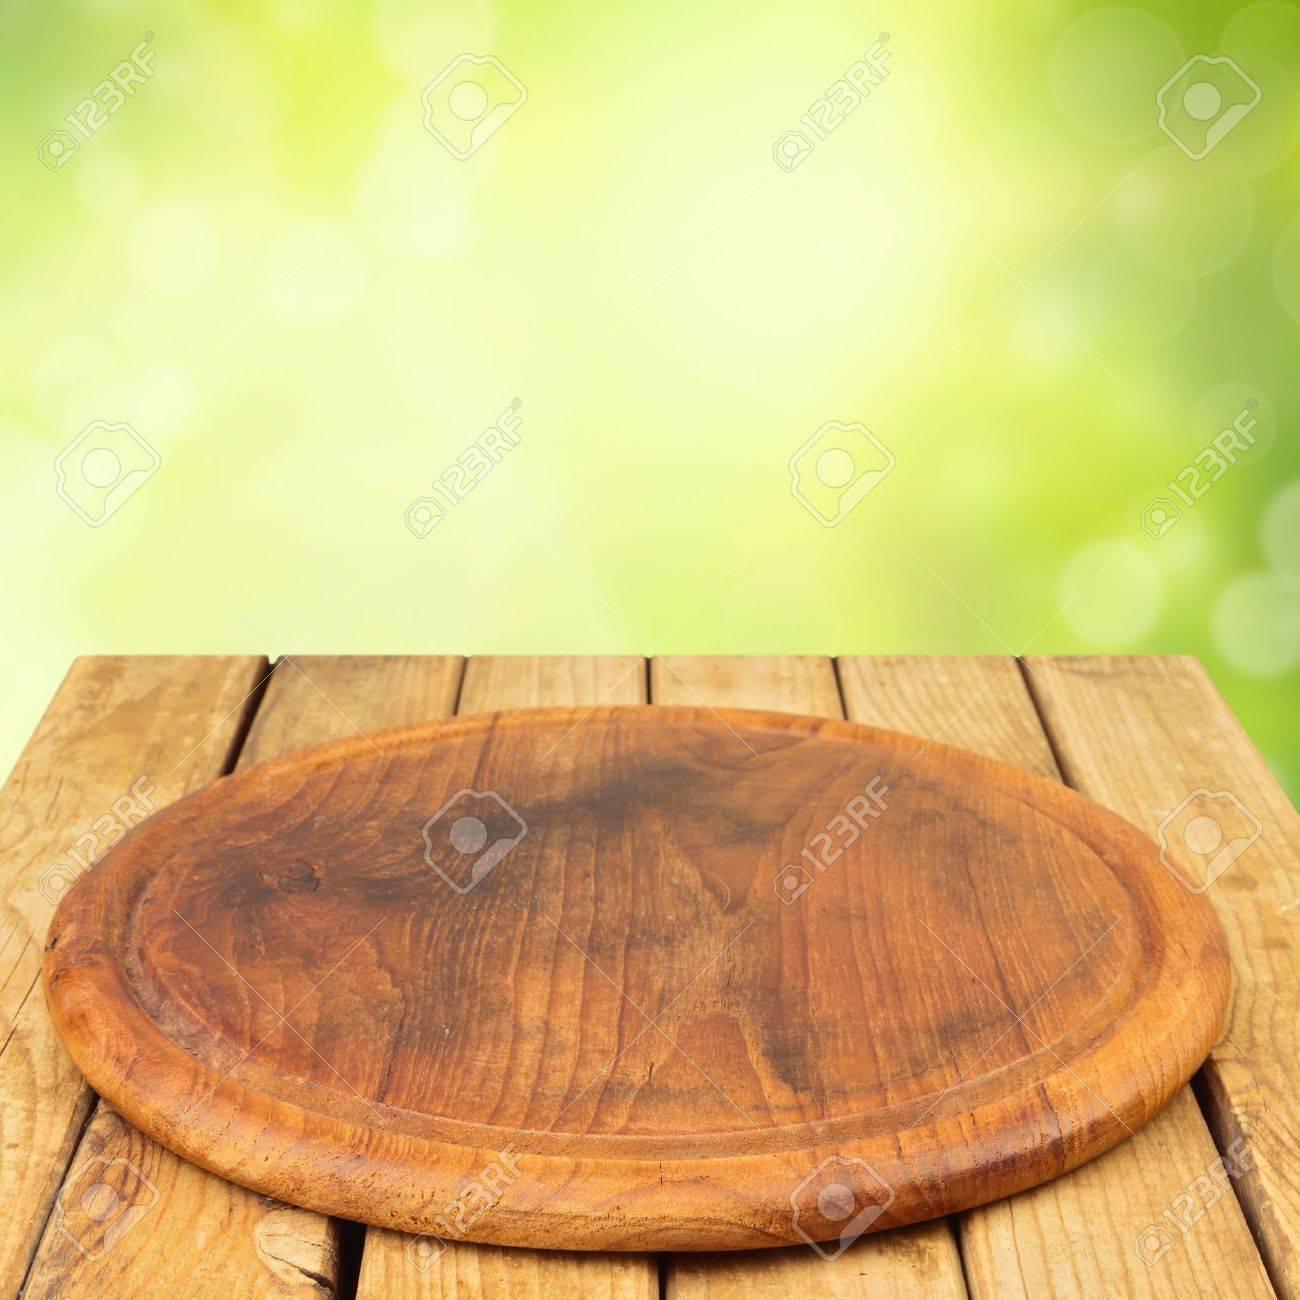 tabla de madera en la mesa de madera sobre fondo de bokeh de jardn foto de